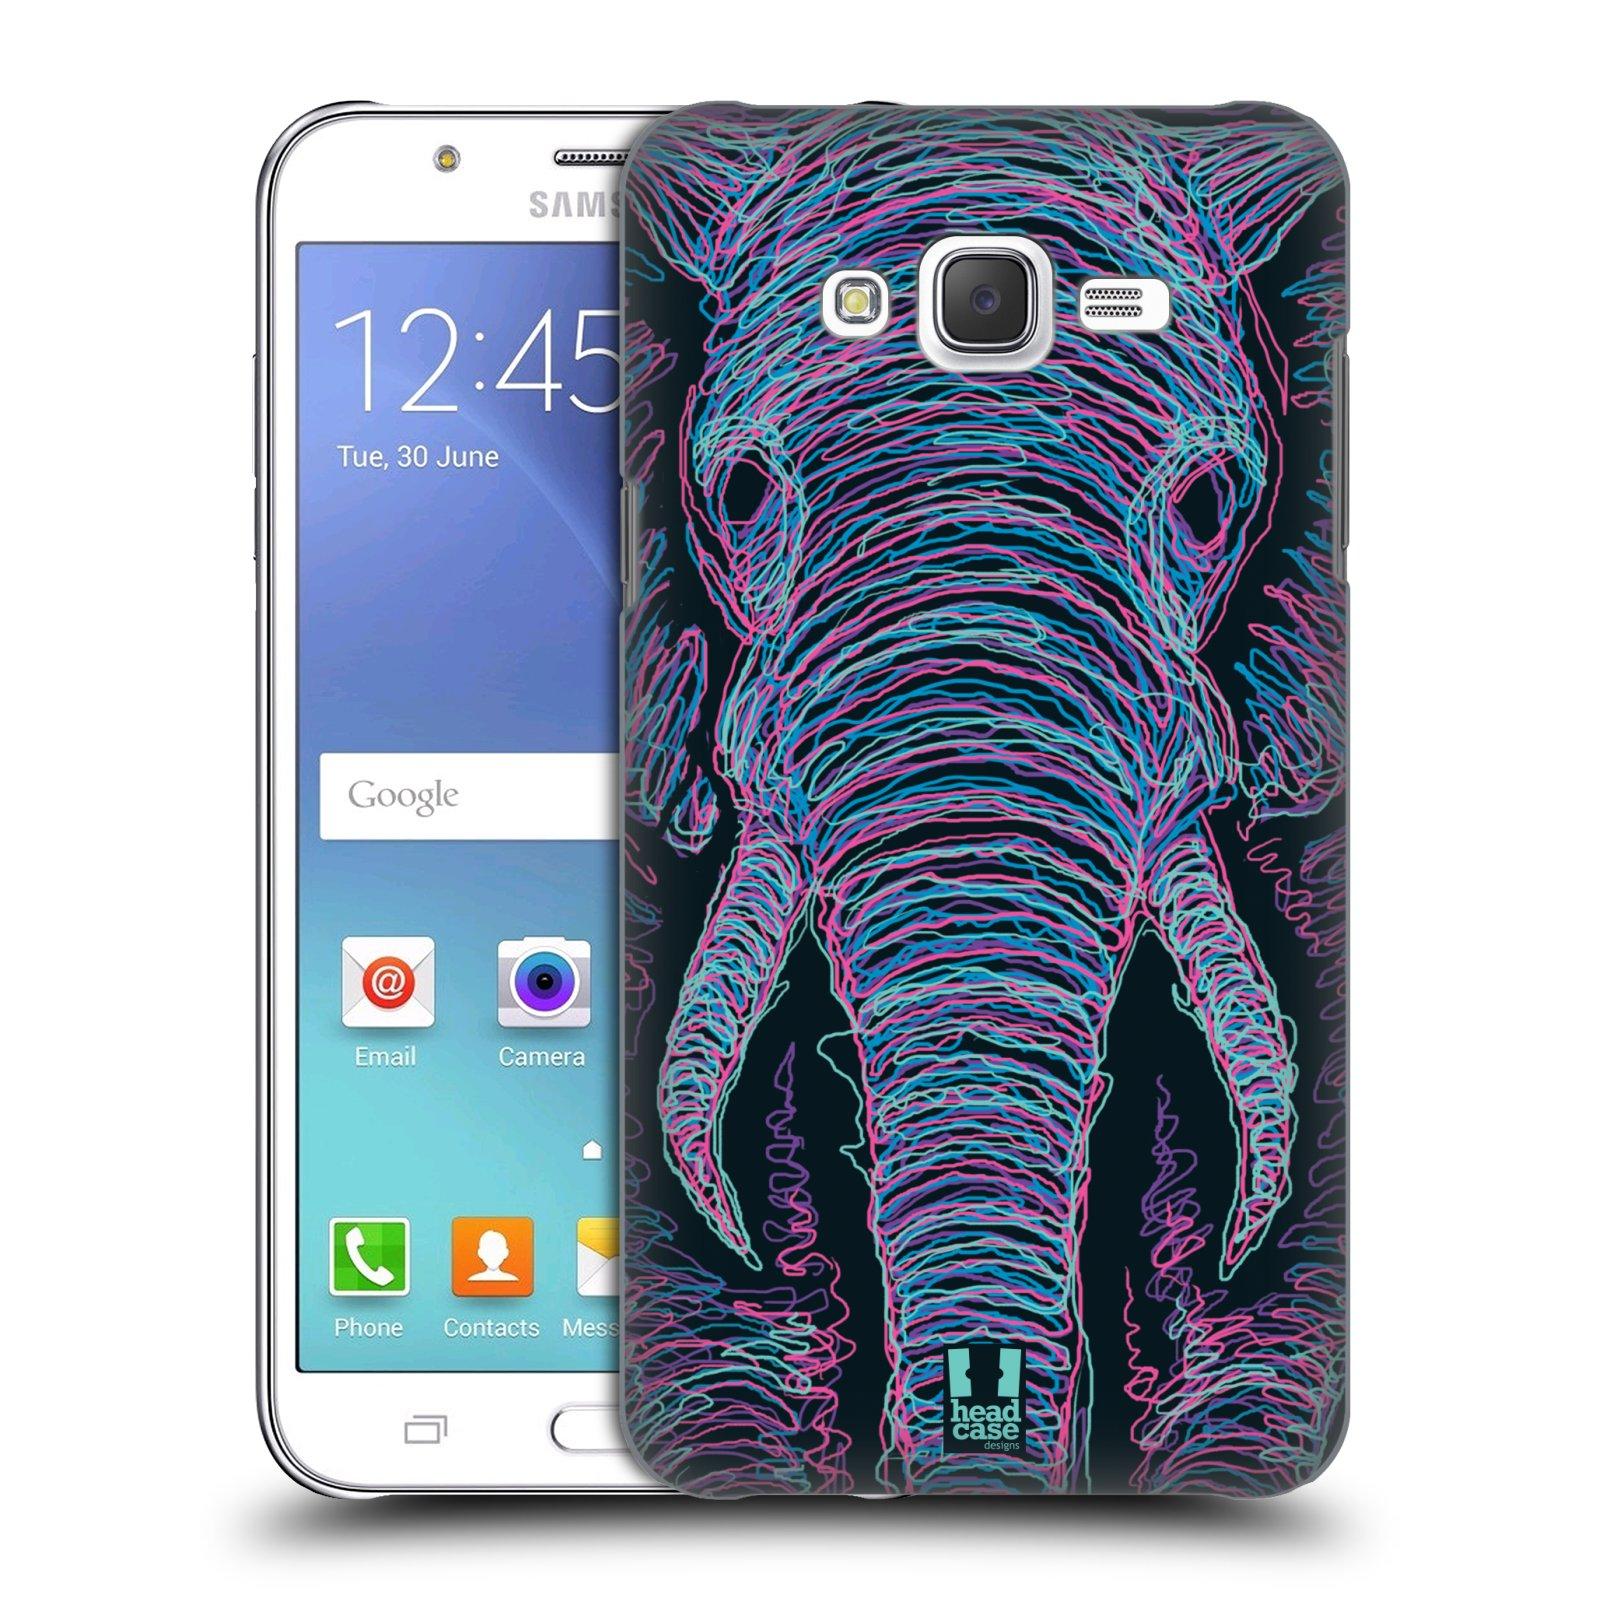 HEAD CASE plastový obal na mobil SAMSUNG Galaxy J7, J700 vzor zvíře čmáranice slon